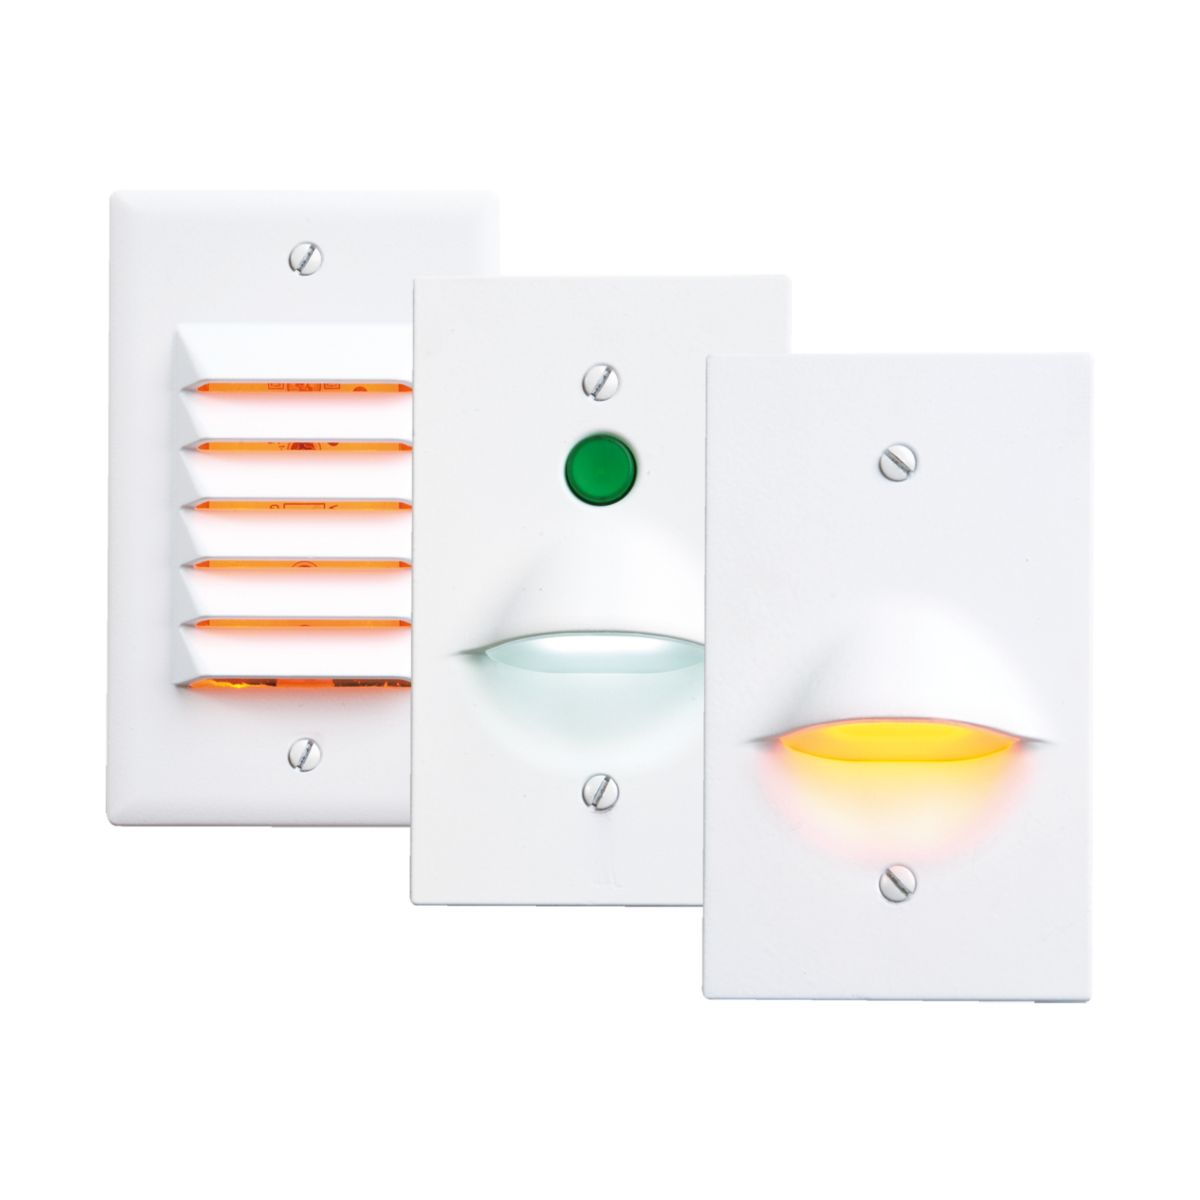 MCL, MSN, MHN, MLN Nightlights LED